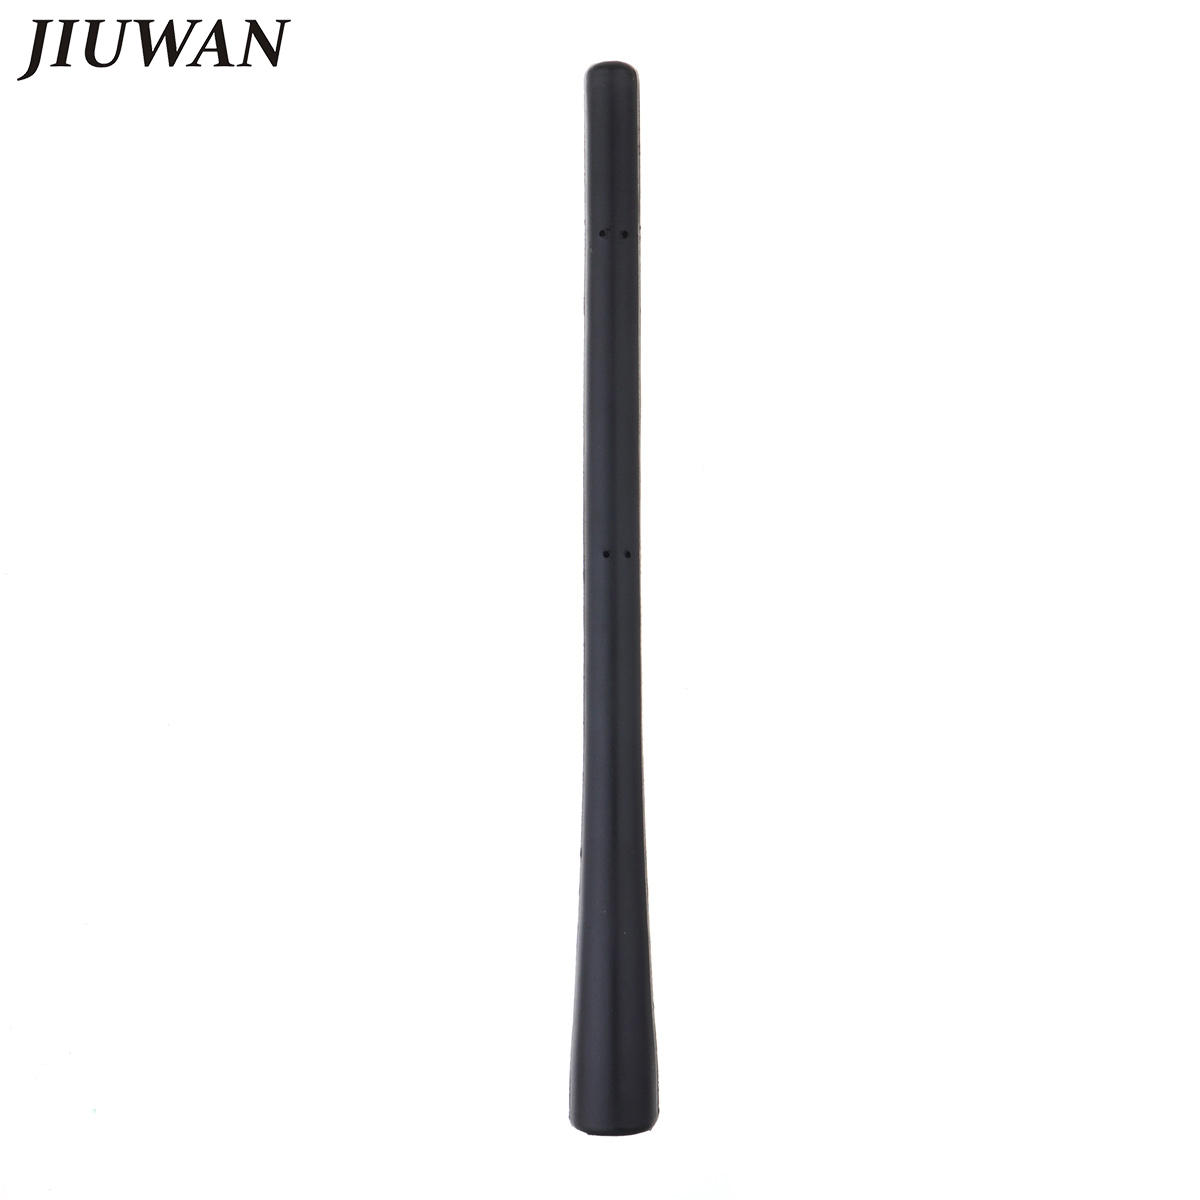 Qii lu SI-AT14036 Antena de antena universal de aleta de tibur/ón para autom/óvil antena de se/ñal de radio AM//FM de techo negra